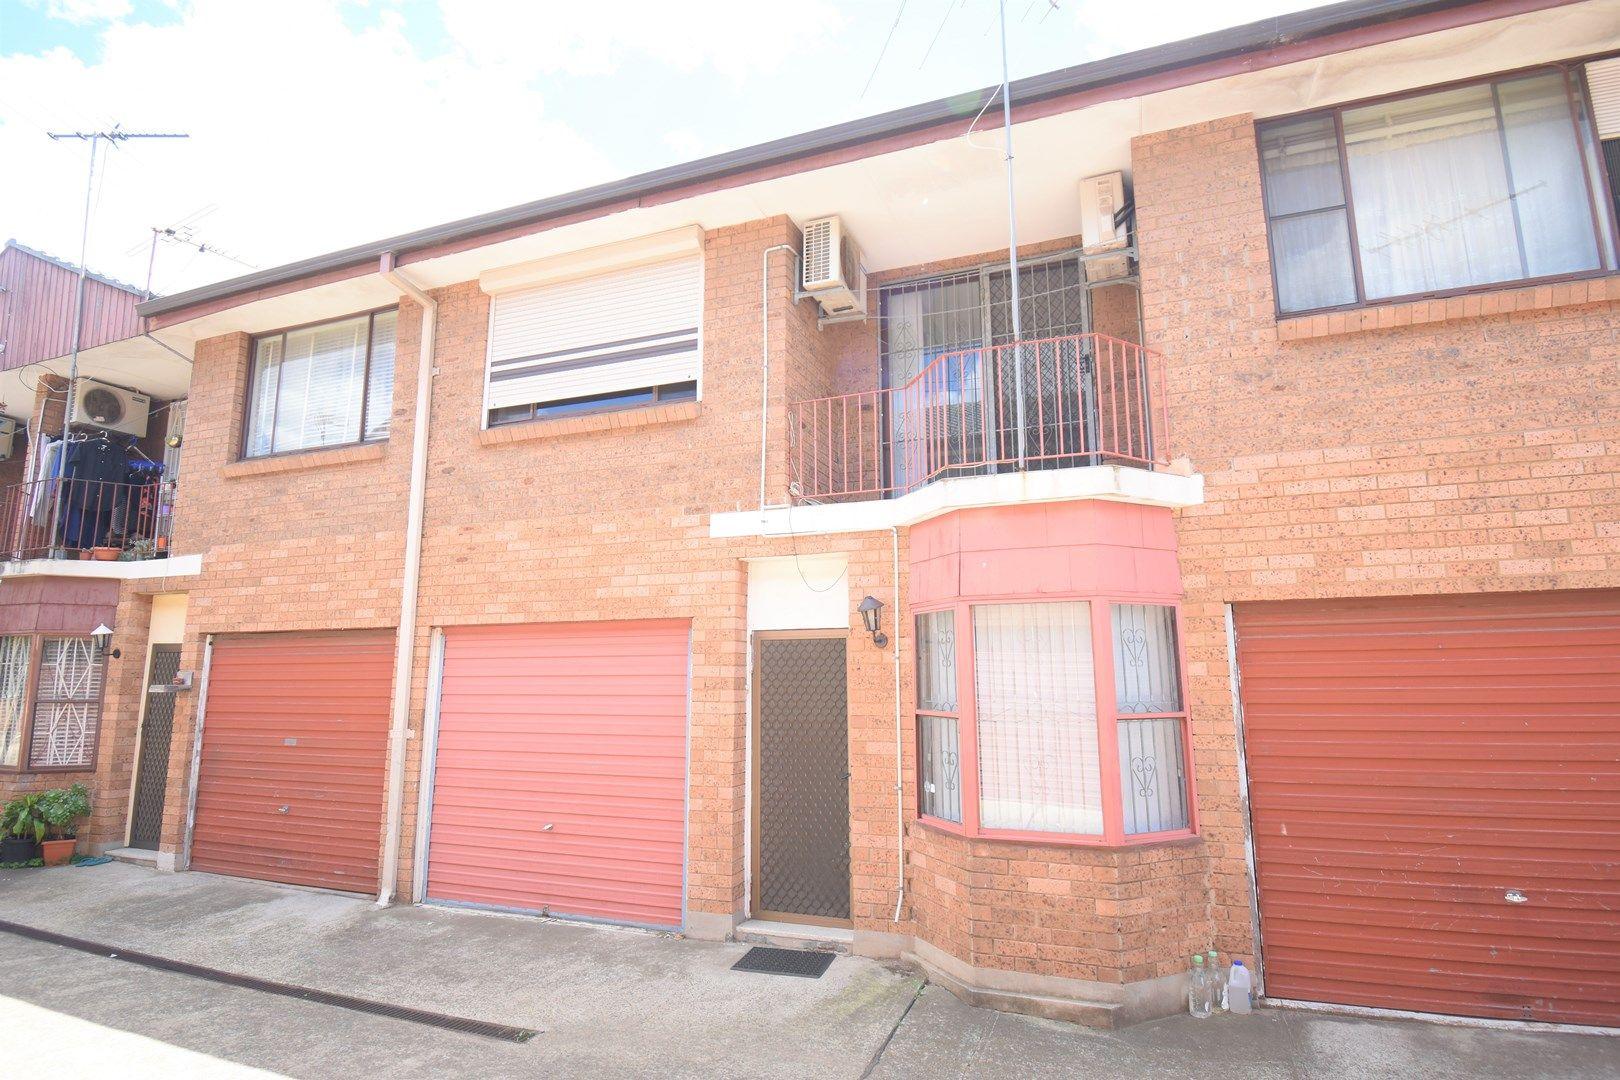 14/14-16 Hill Street, Cabramatta NSW 2166, Image 0